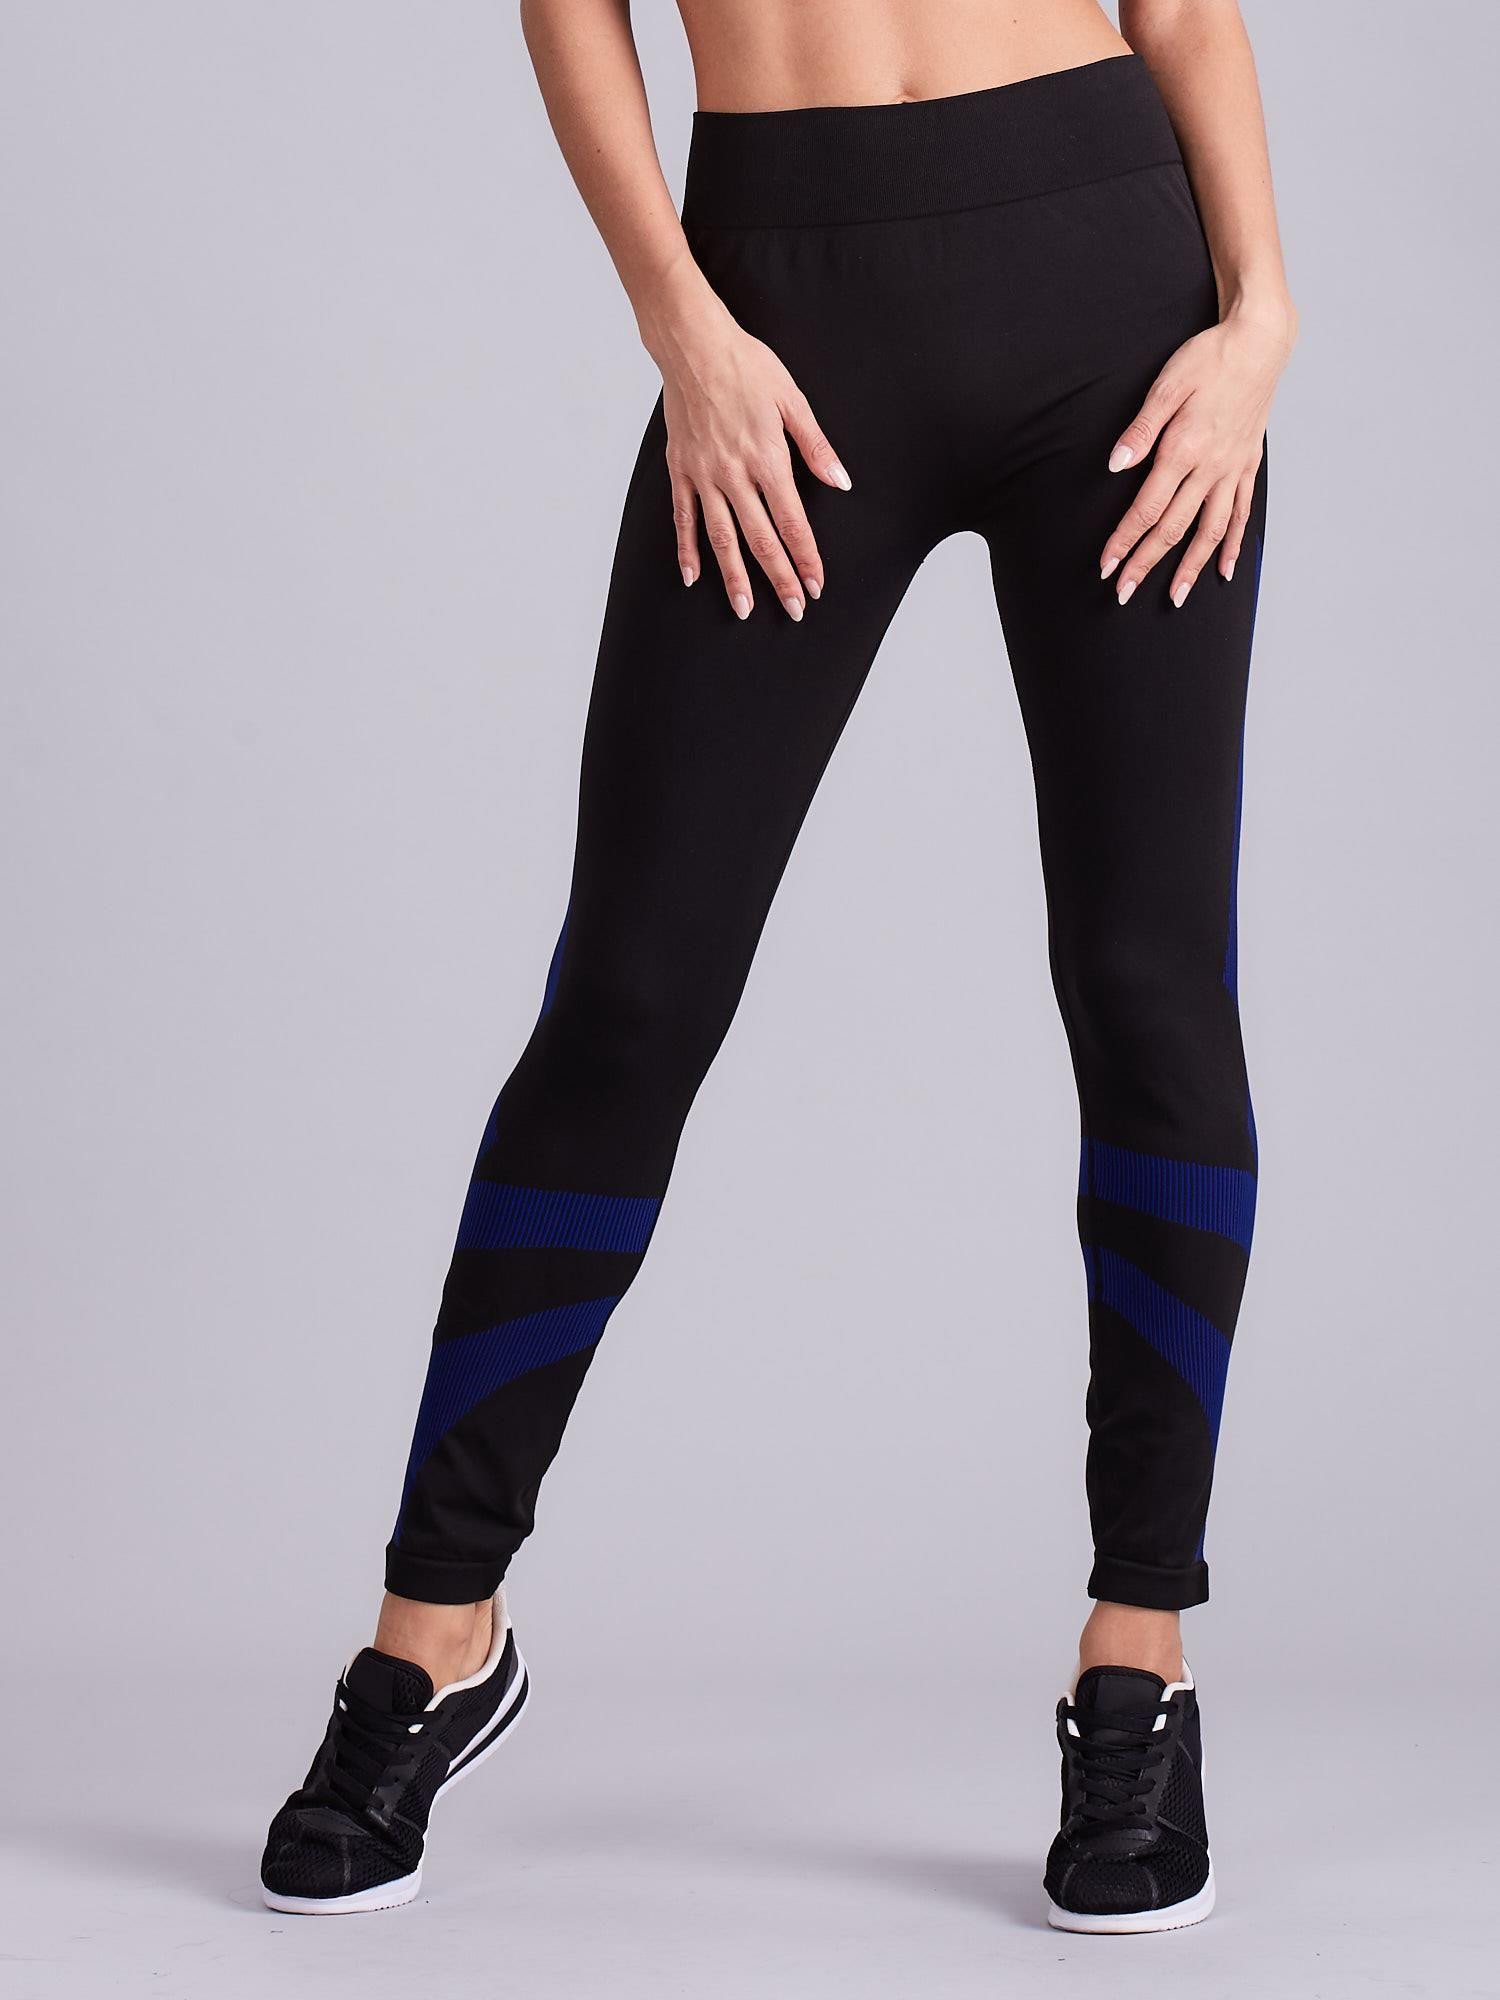 6e14ab73 Czarne damskie legginsy sportowe